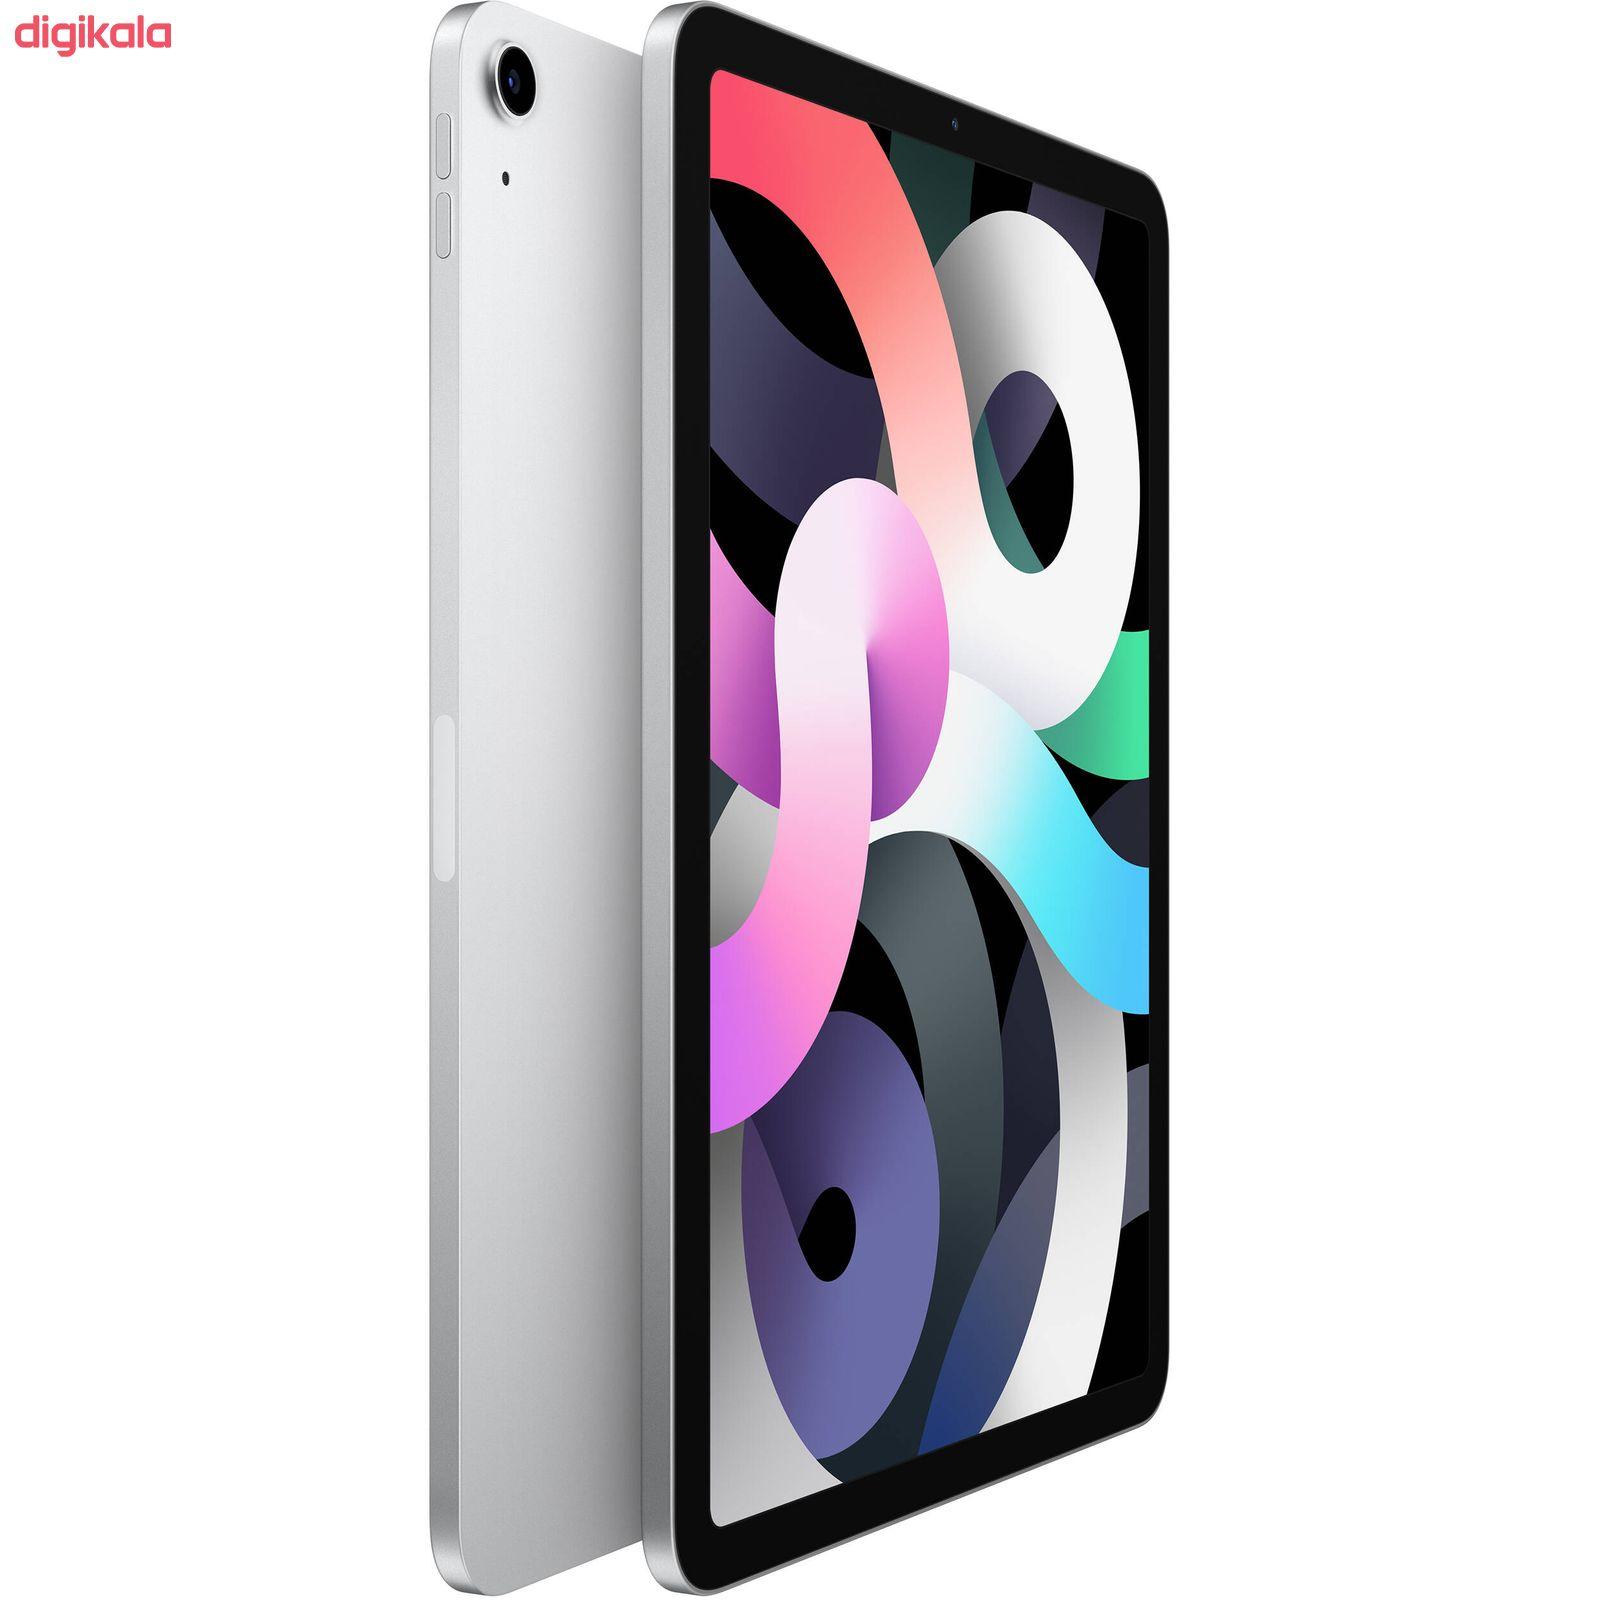 تبلت اپل مدل iPad Air 10.9 inch 2020 WiFi ظرفیت 256 گیگابایت  main 1 14